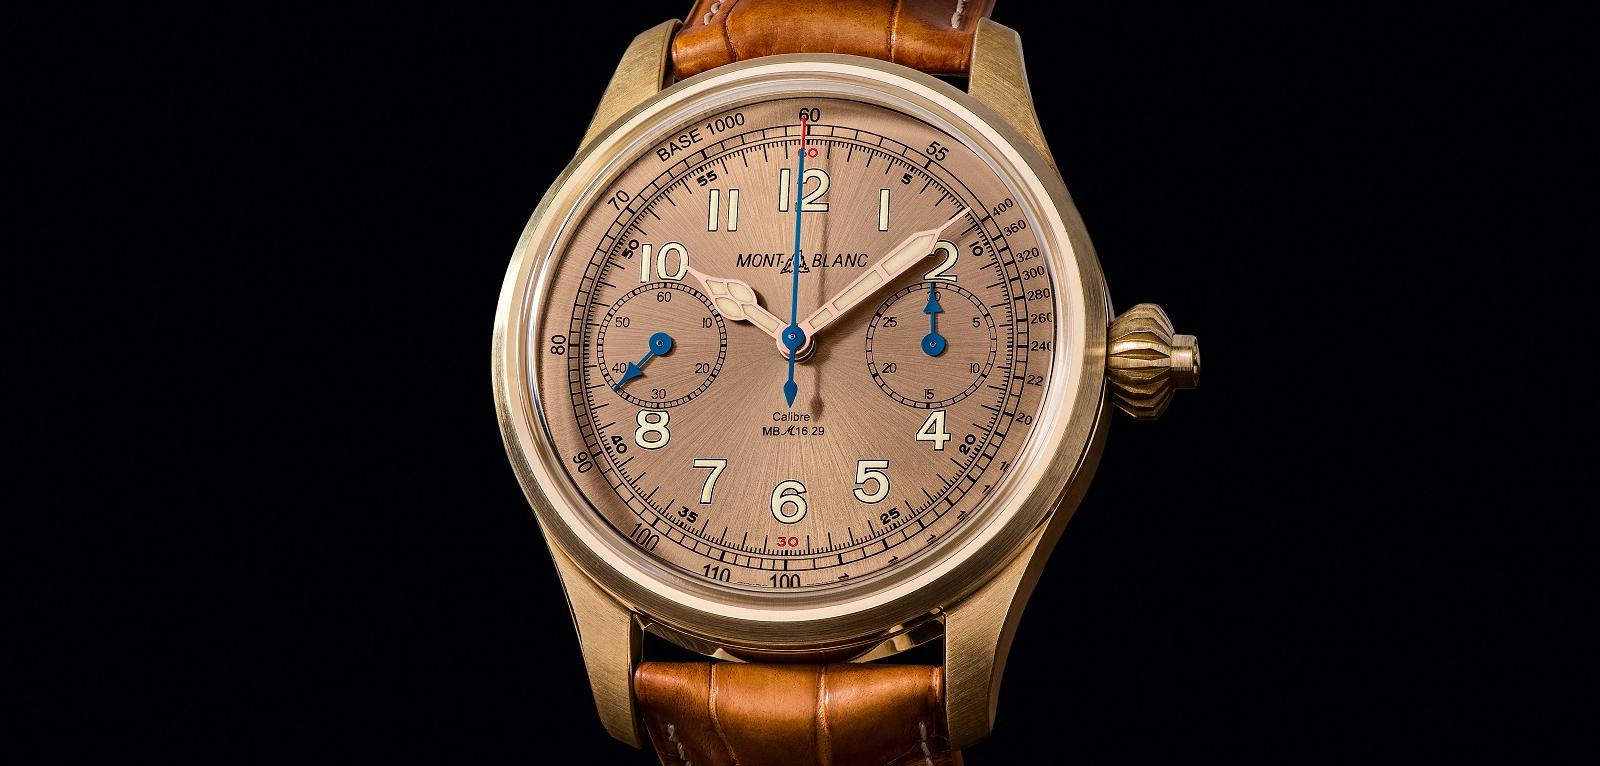 Montblanc-1858-Chronograph-Tachymeter-SIAR-2017-Header